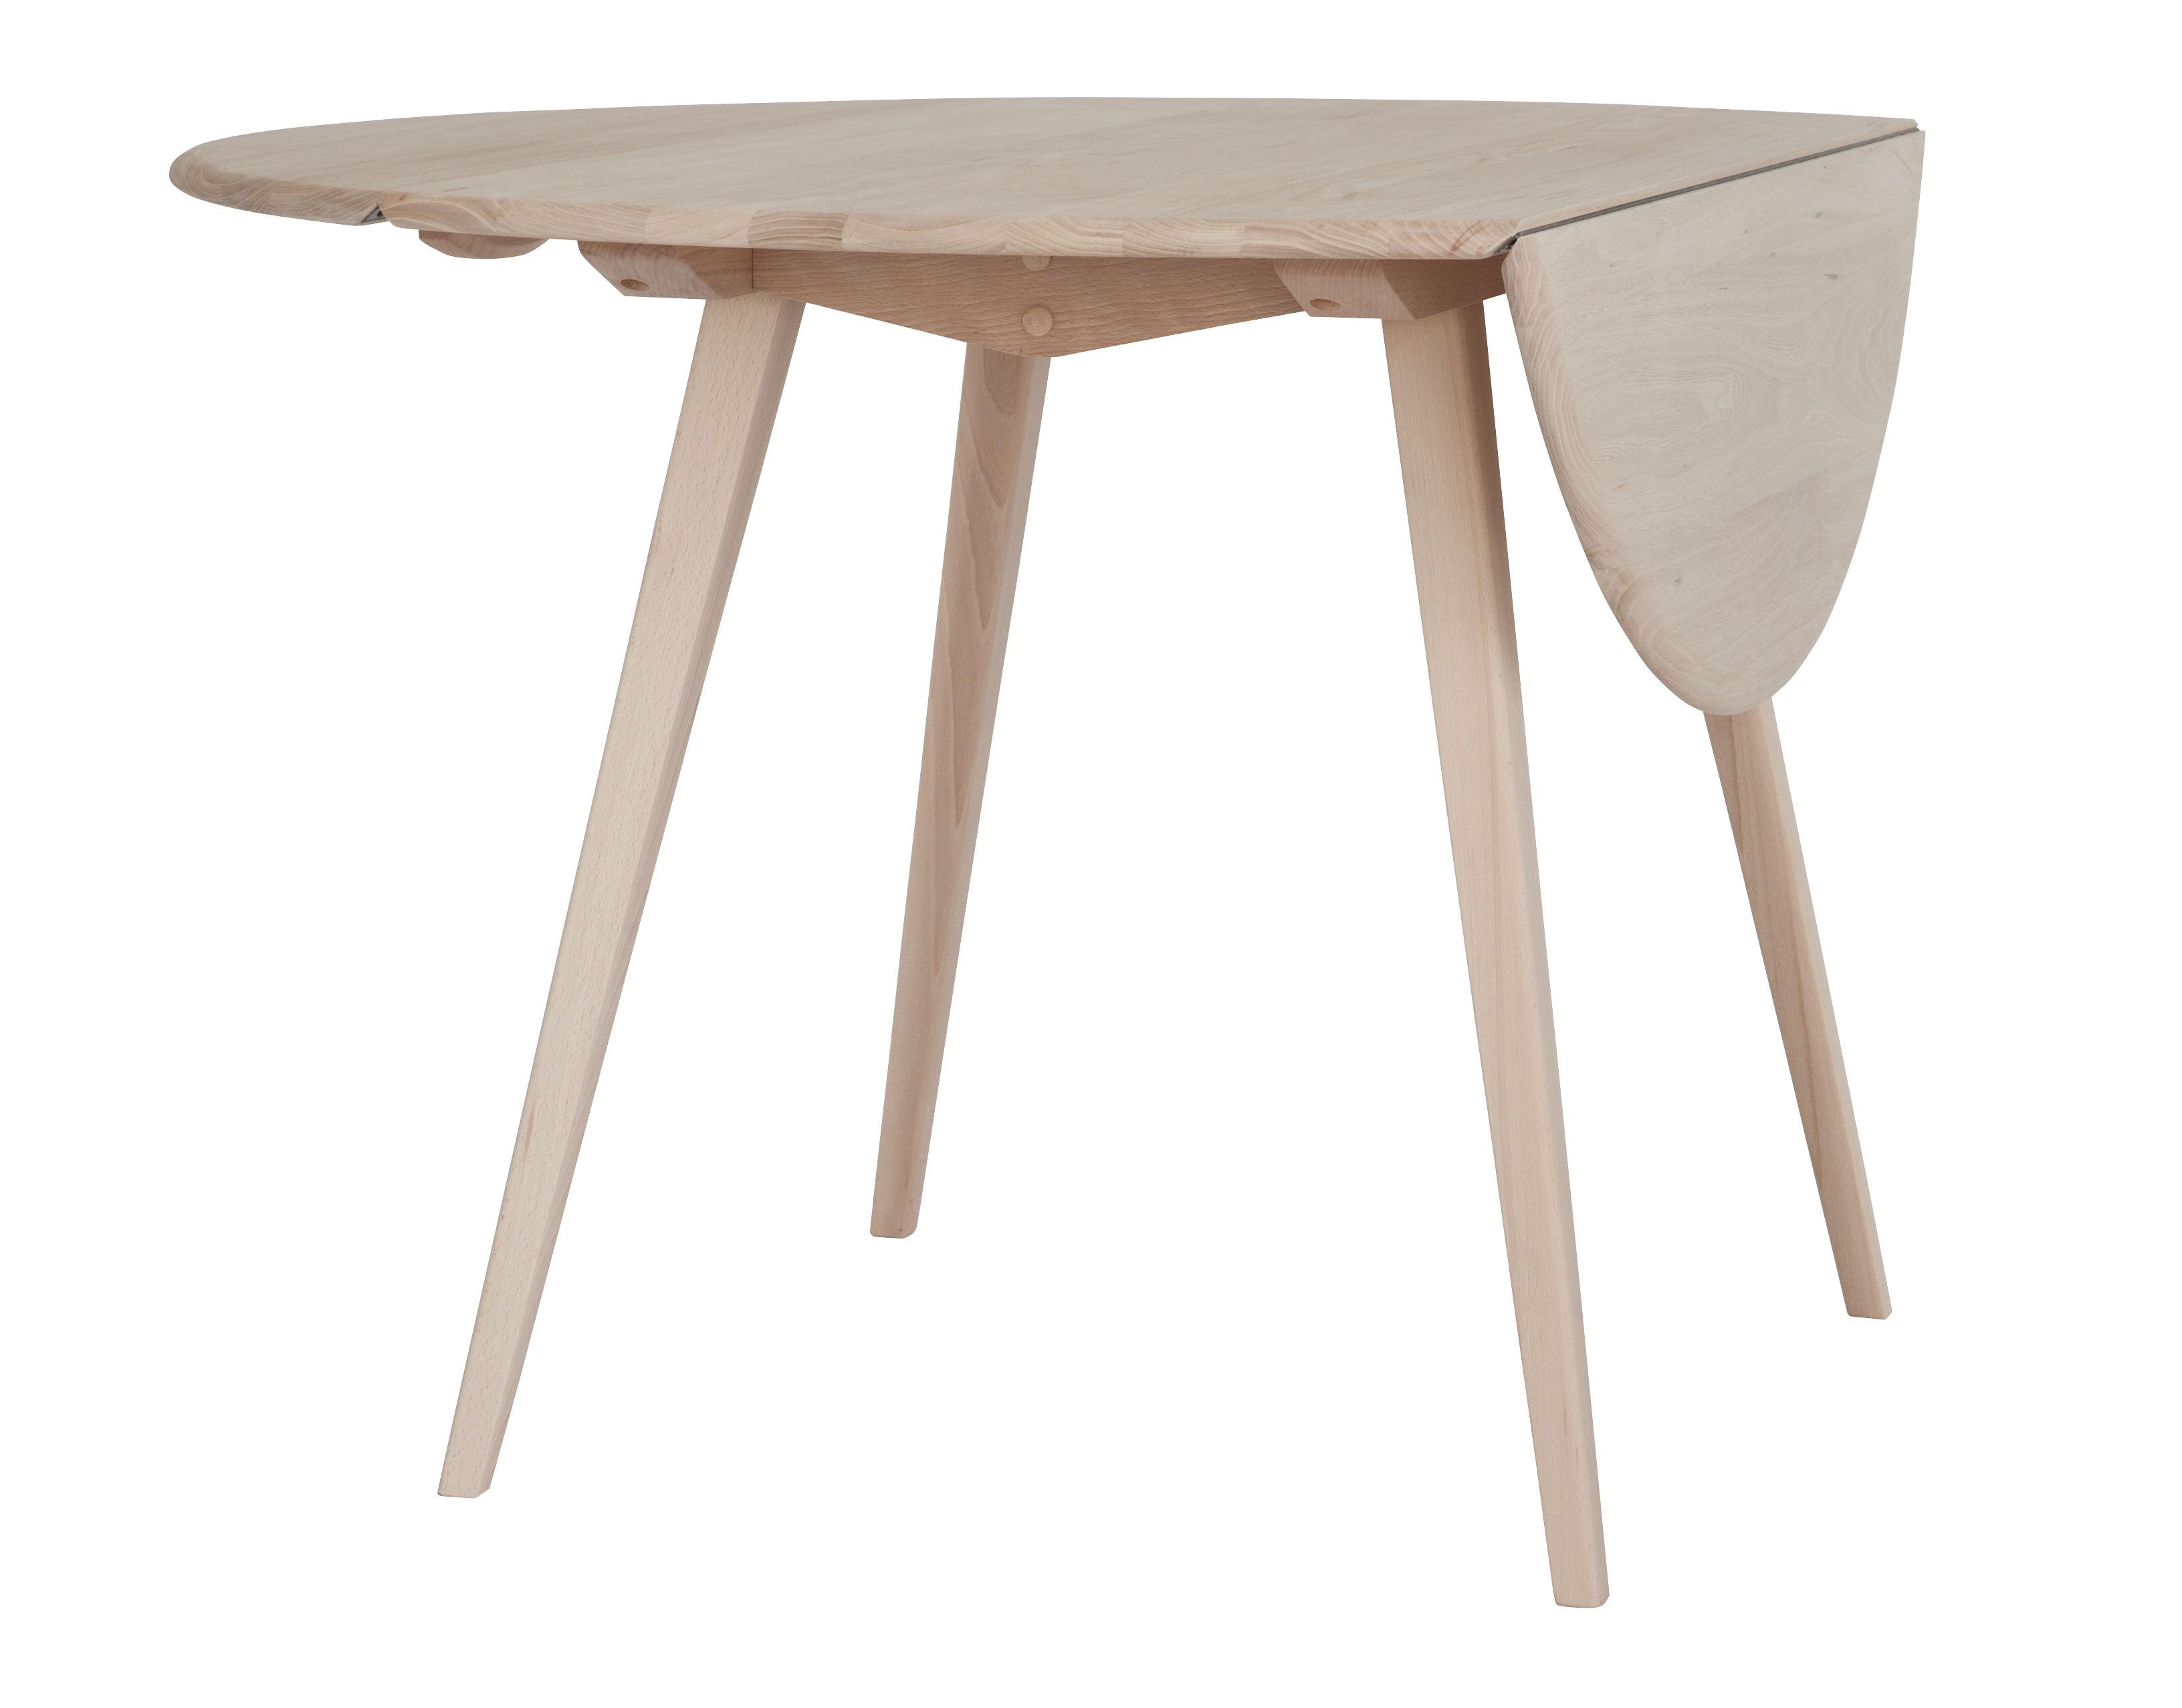 drop leaf extending table 110 cm oak natural wood by ercol. Black Bedroom Furniture Sets. Home Design Ideas